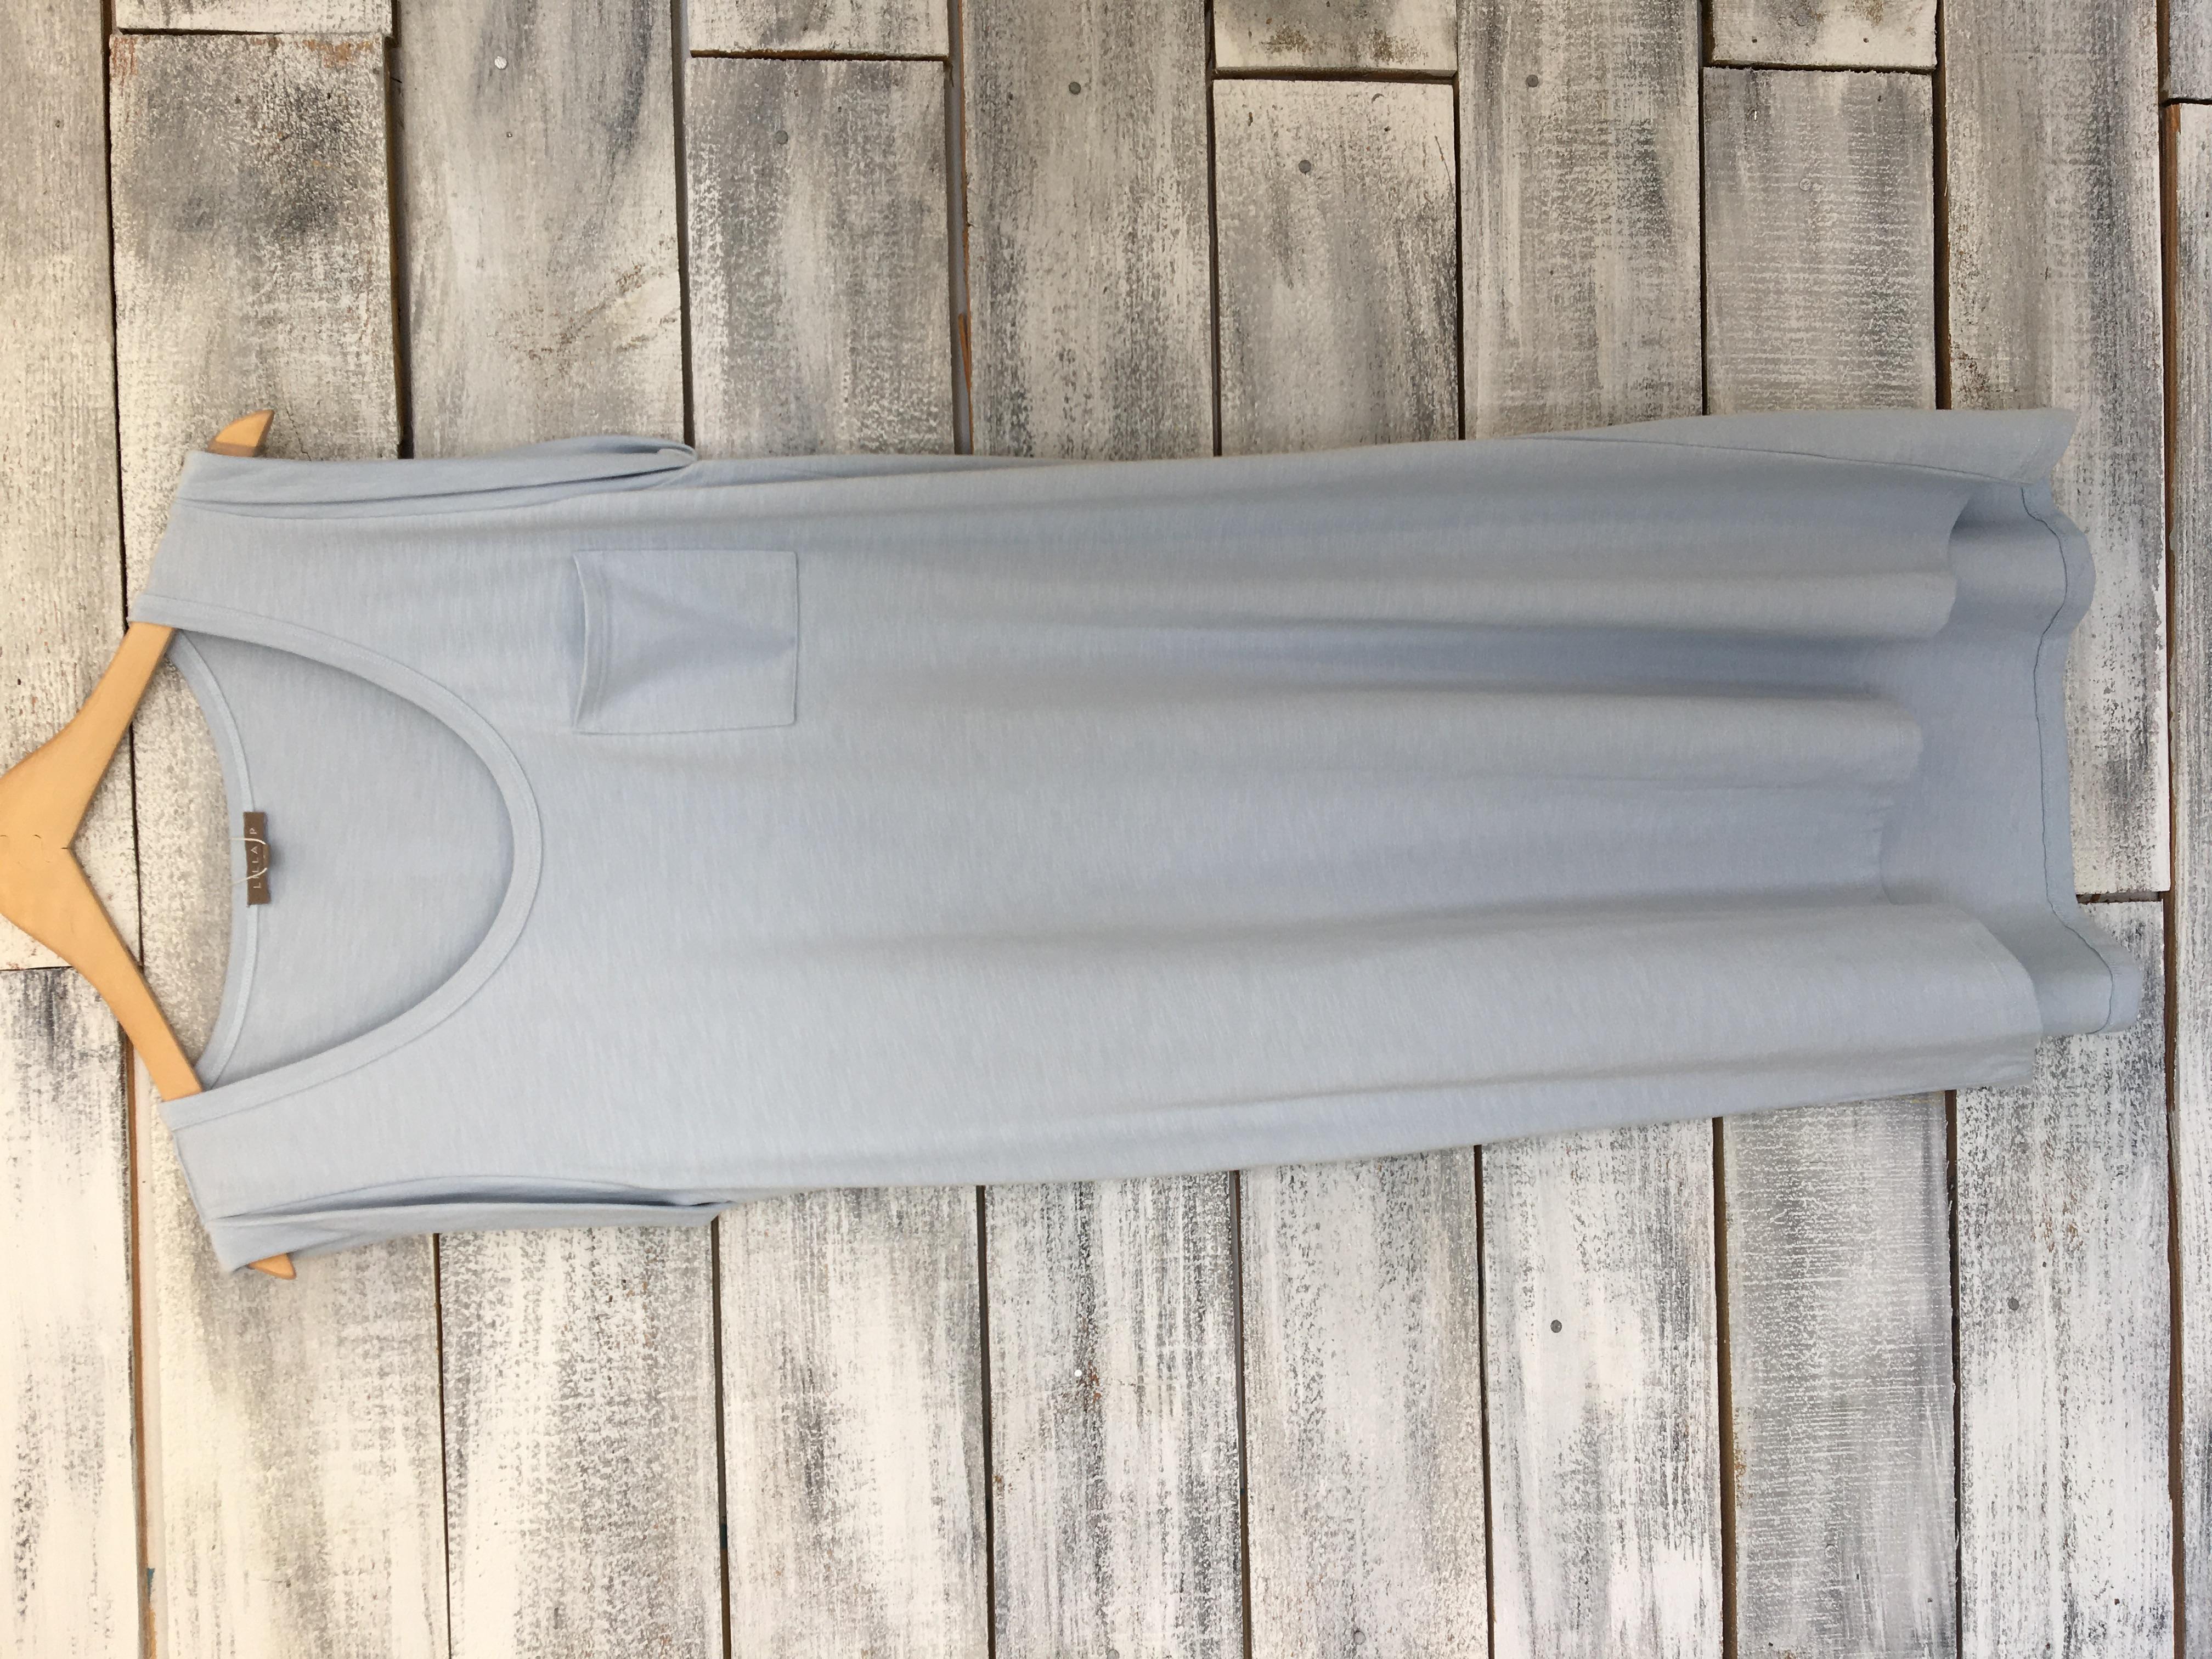 ICE SCOOP NECK POCKET DRESS